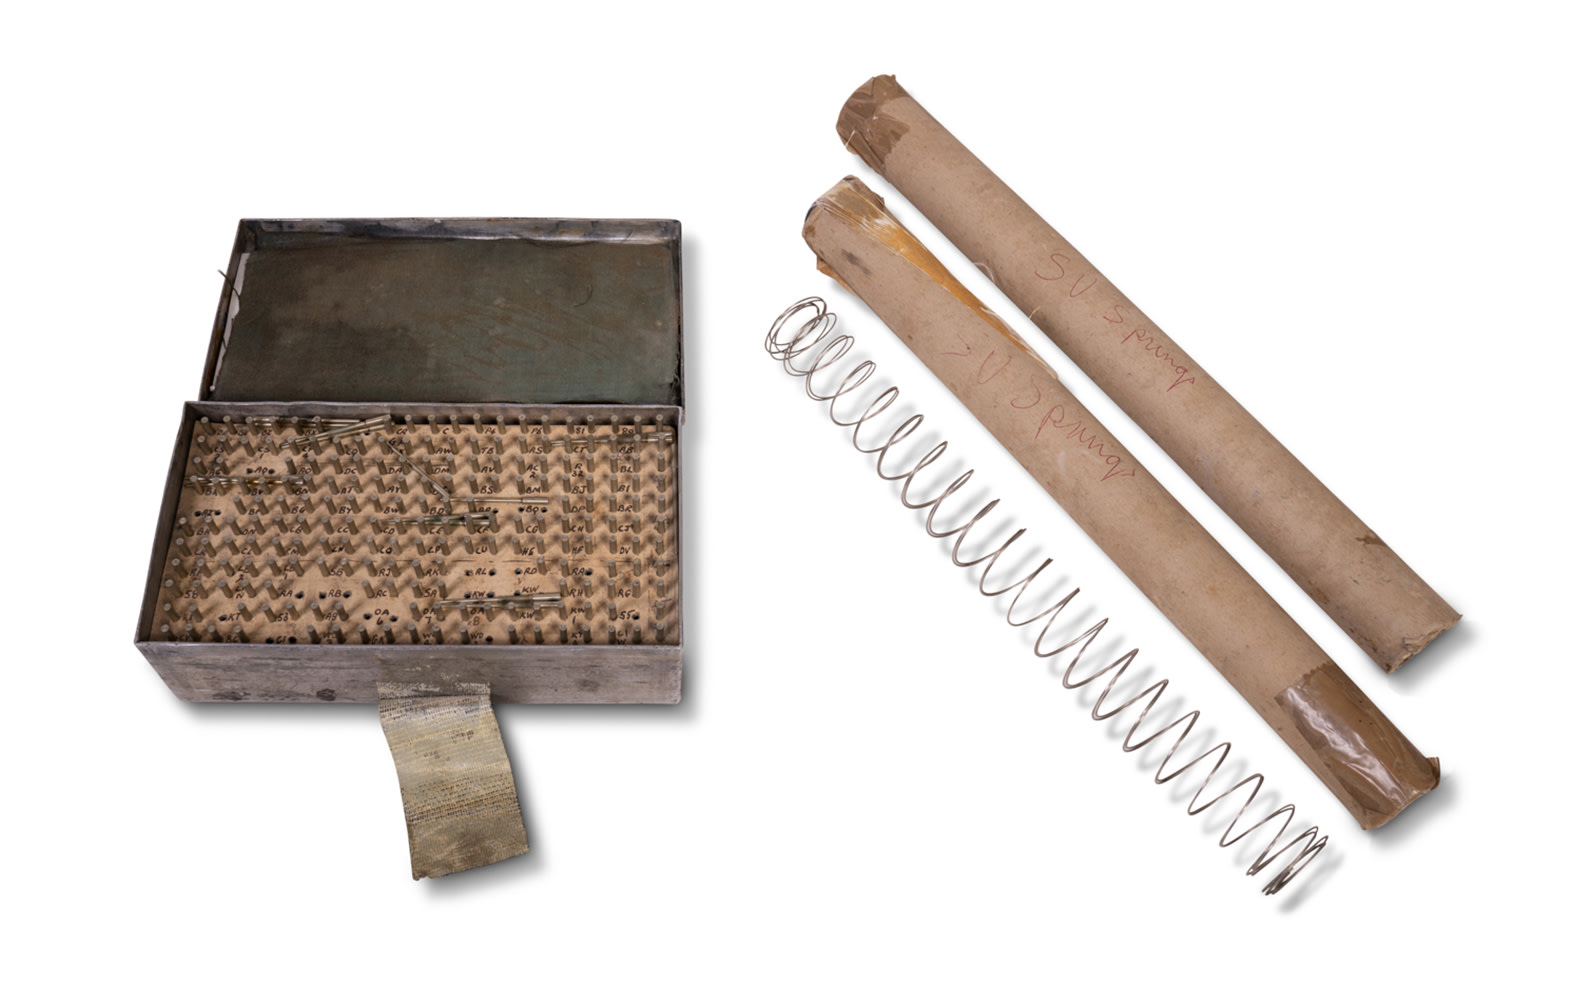 SU Needle Kit and Springs